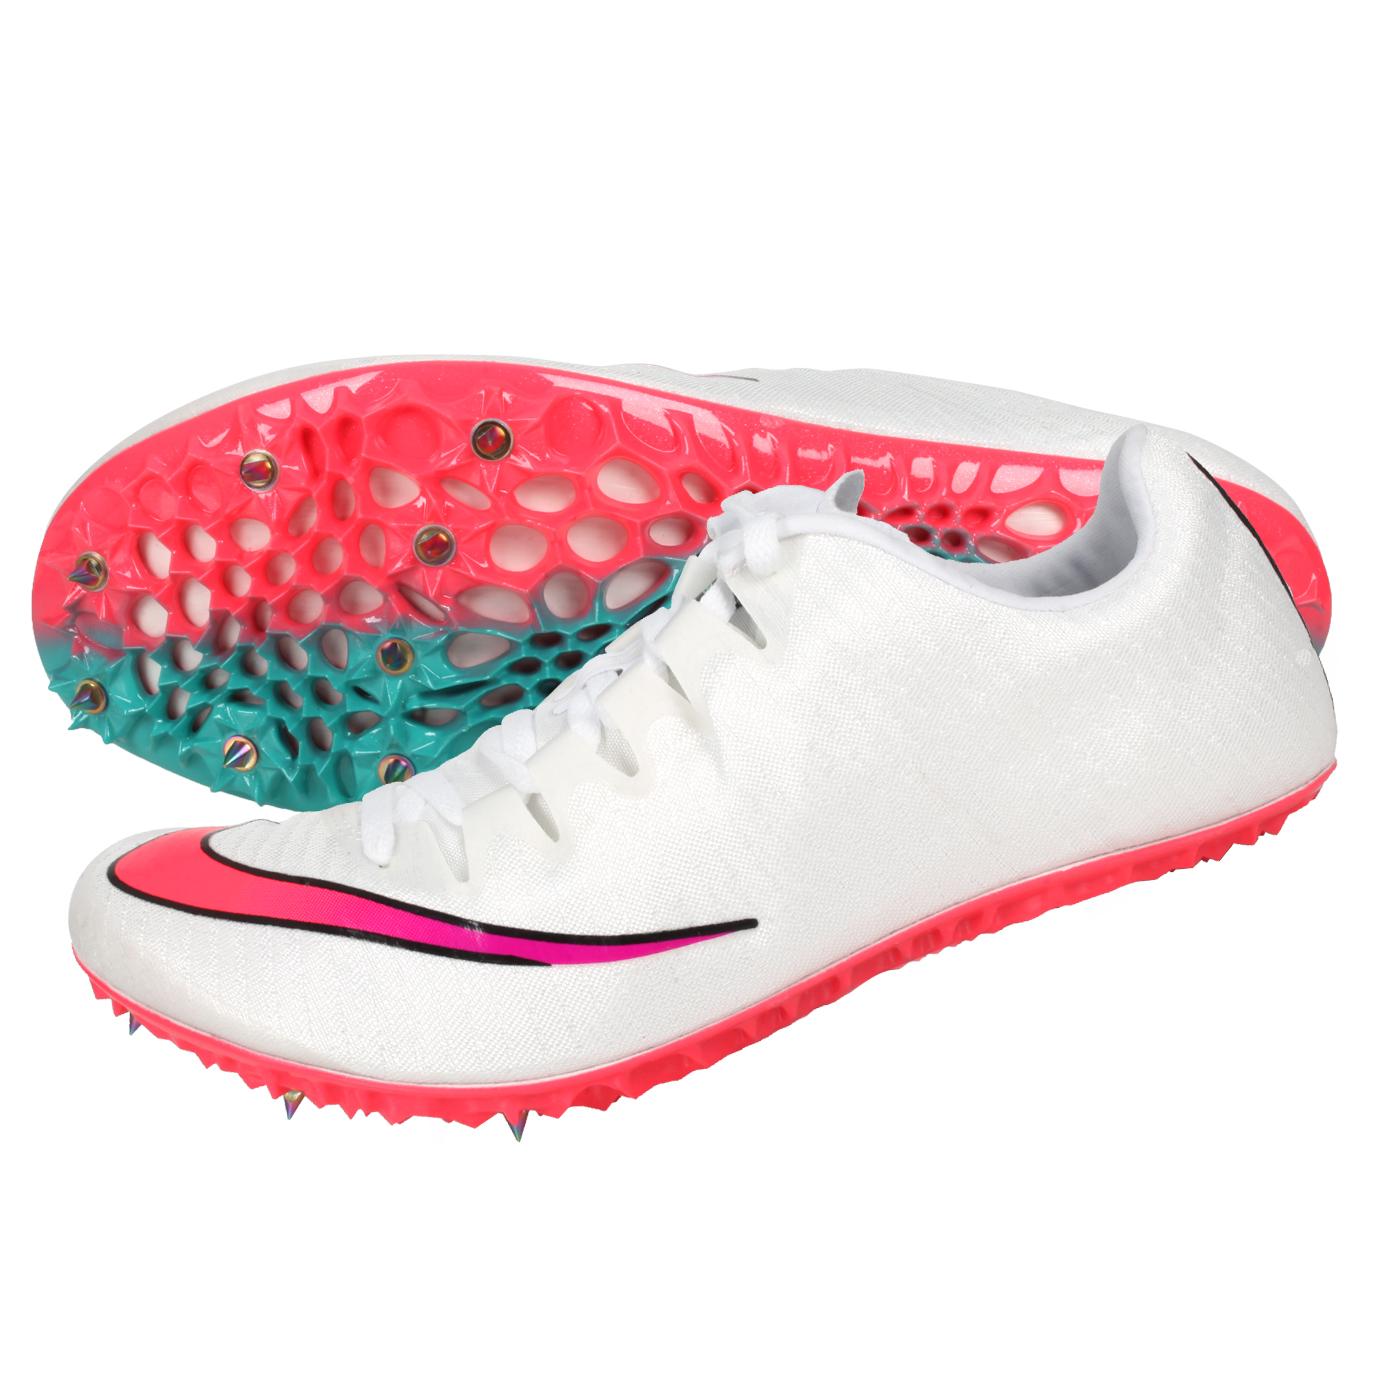 NIKE 田徑釘鞋(短距離)  @ZOOM SUPERFLY ELITE@835996100 - 白粉紫綠藍